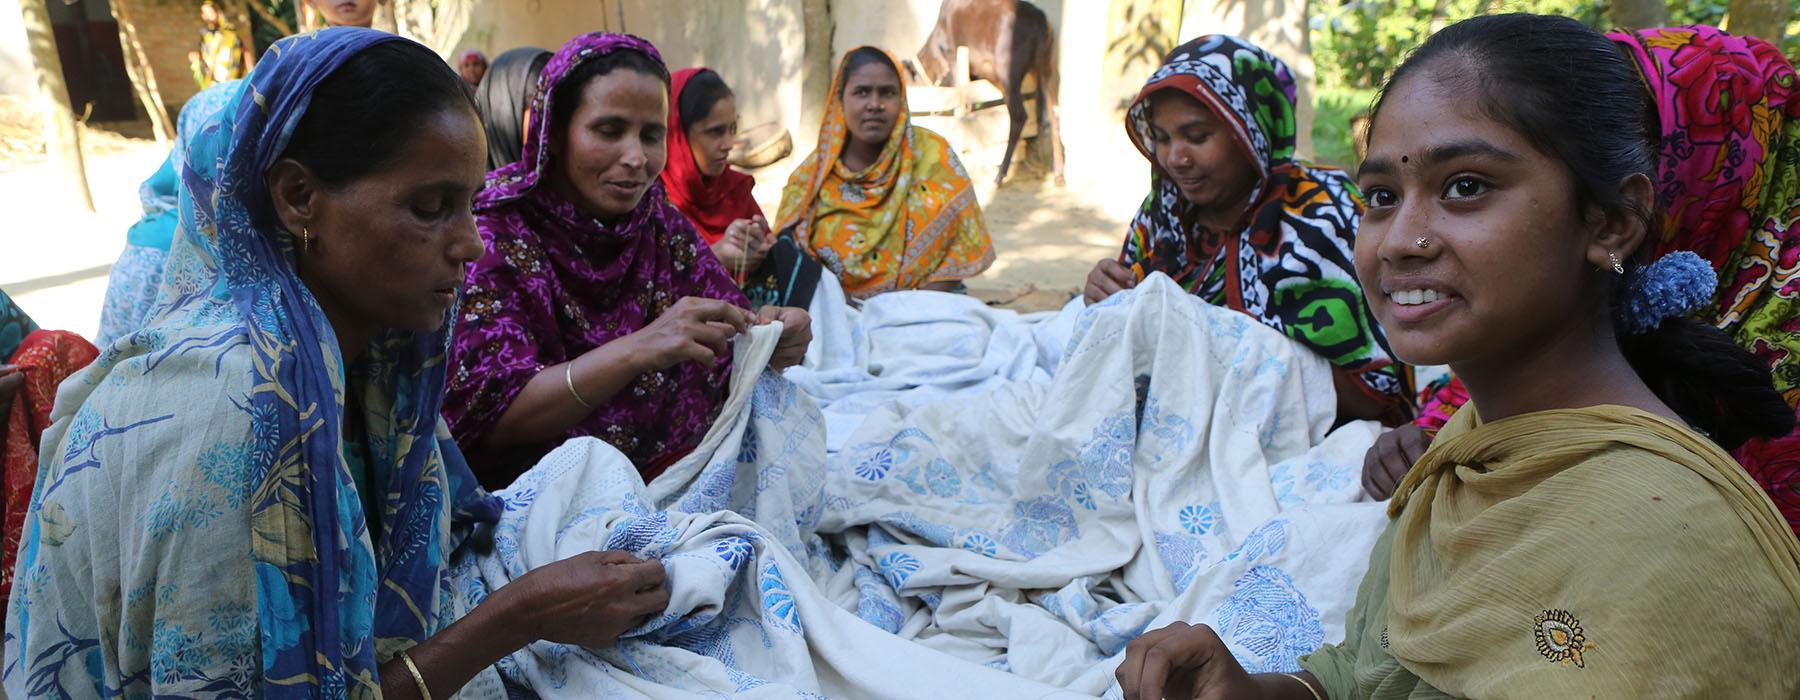 Stitching a kantha near Bogra, Bangladesh